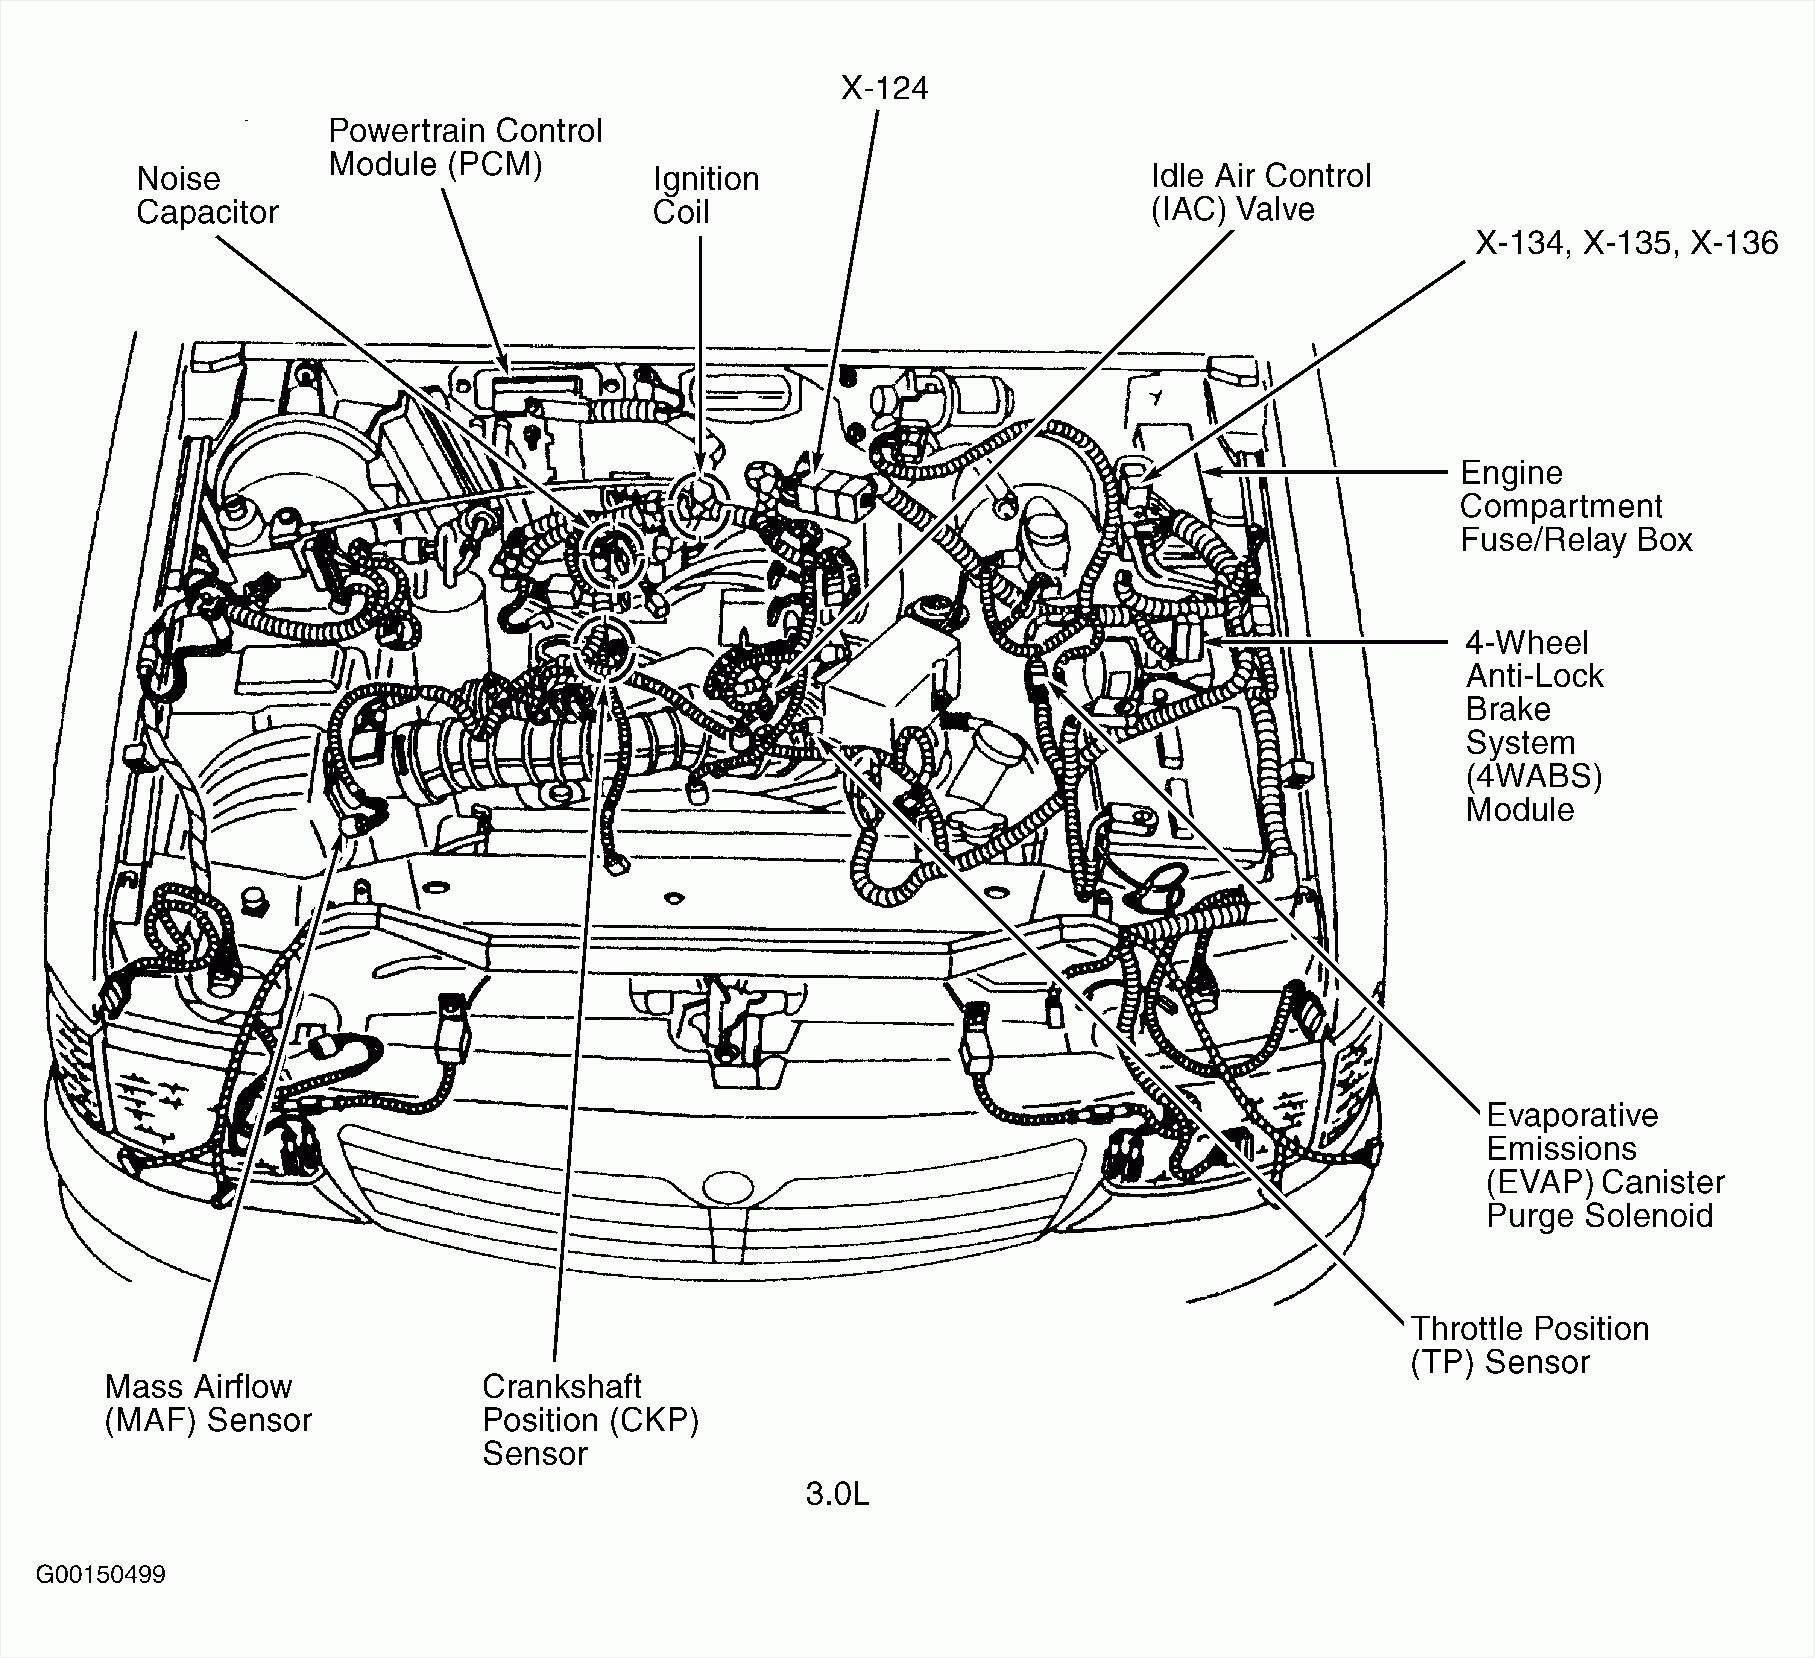 2001 ford Windstar Engine Diagram 2001 ford Windstar 3 8 Engine Diagram Wiring Diagram Paper Of 2001 ford Windstar Engine Diagram